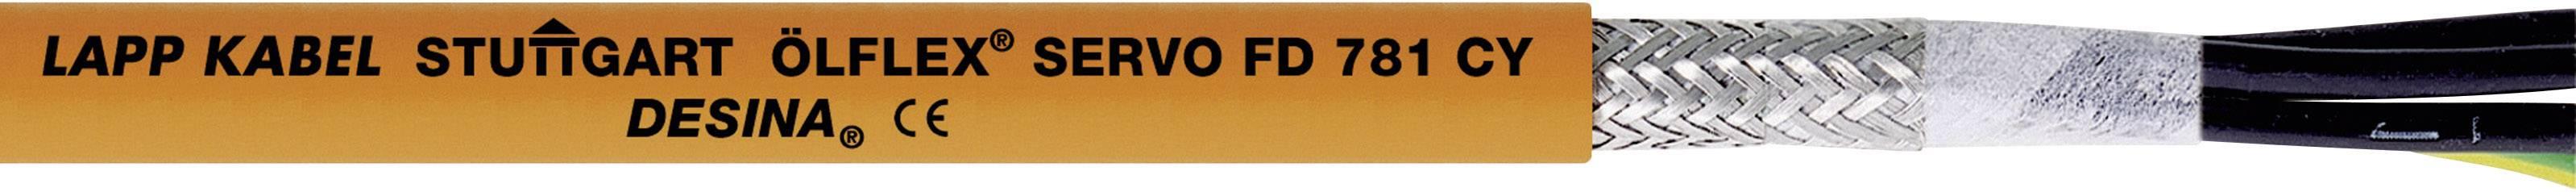 Kabel LappKabel Ölflex SERVO FD 781 CY 4G2,5 (0036321), 11,9 mm, oranžová, 1000 m